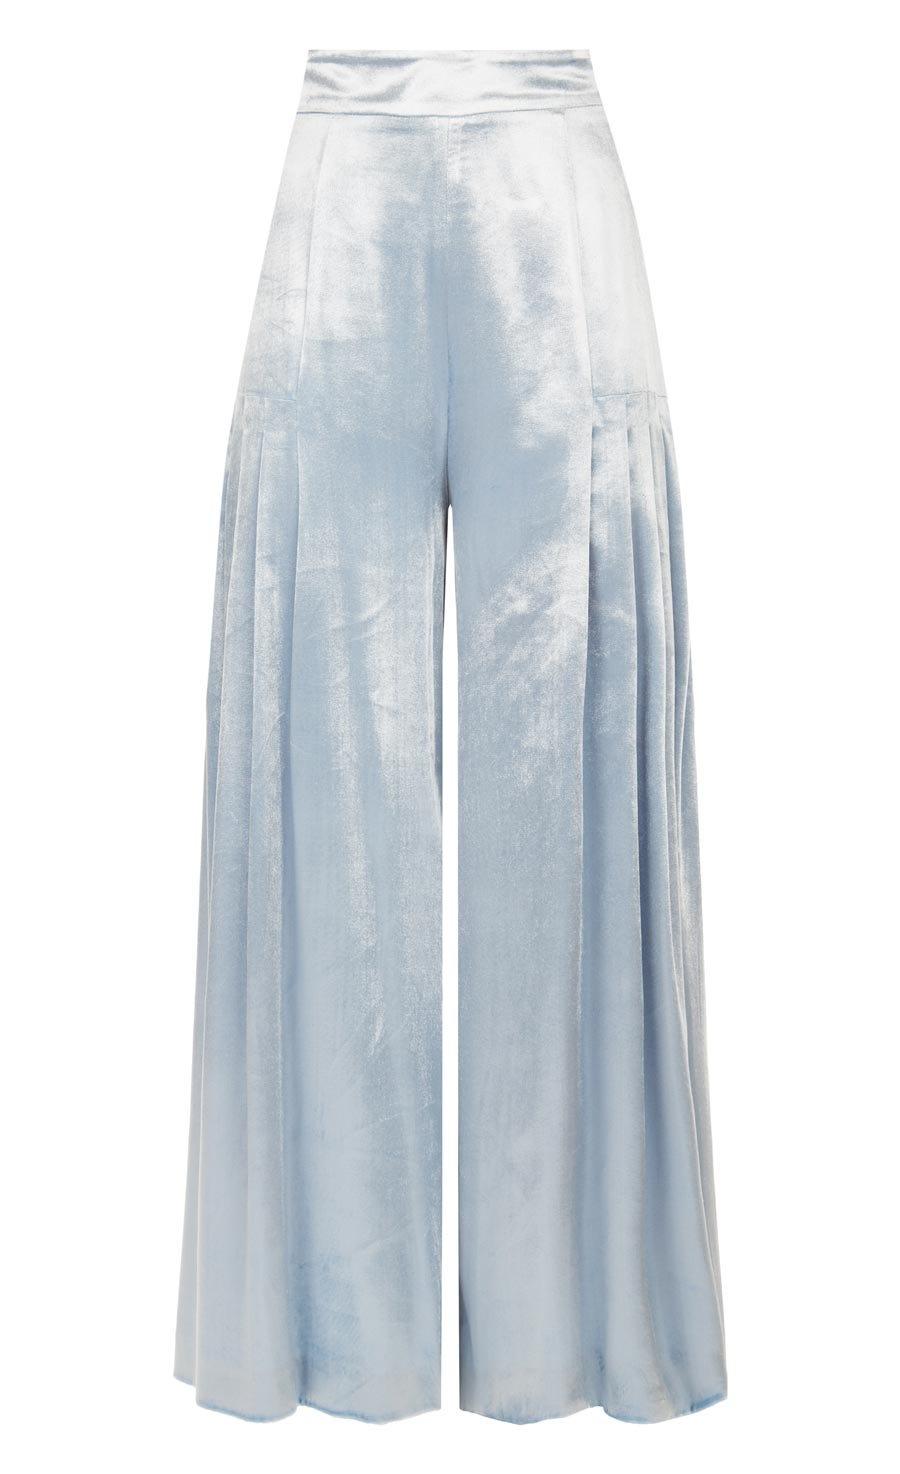 Breeze Trousers, Iris